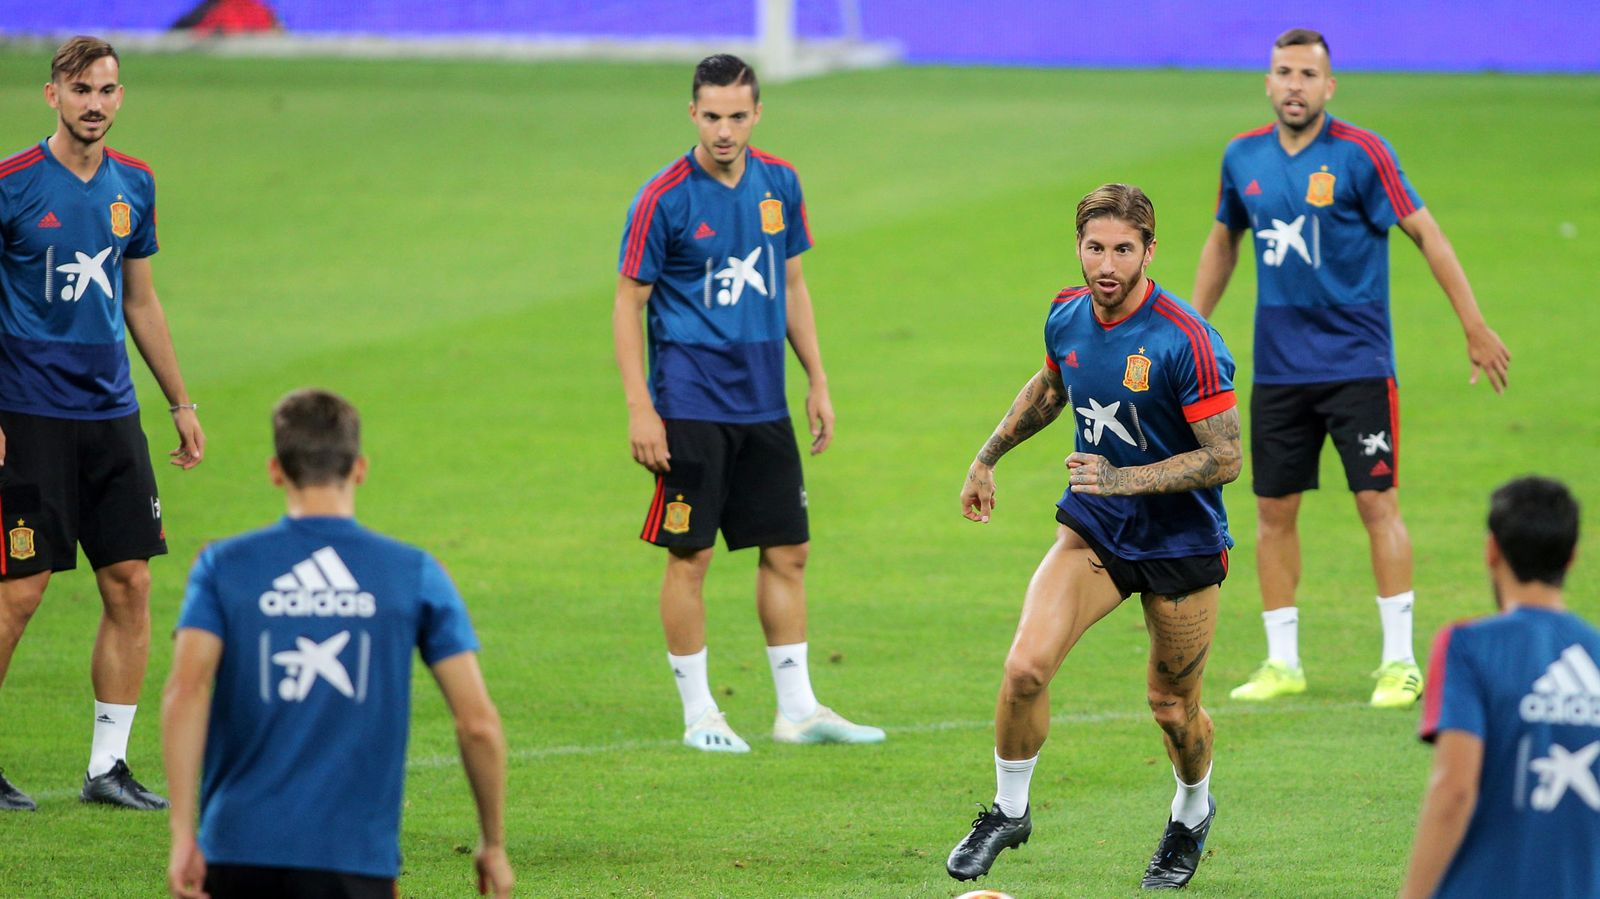 Foto: Euro 2020 qualifier - spain training